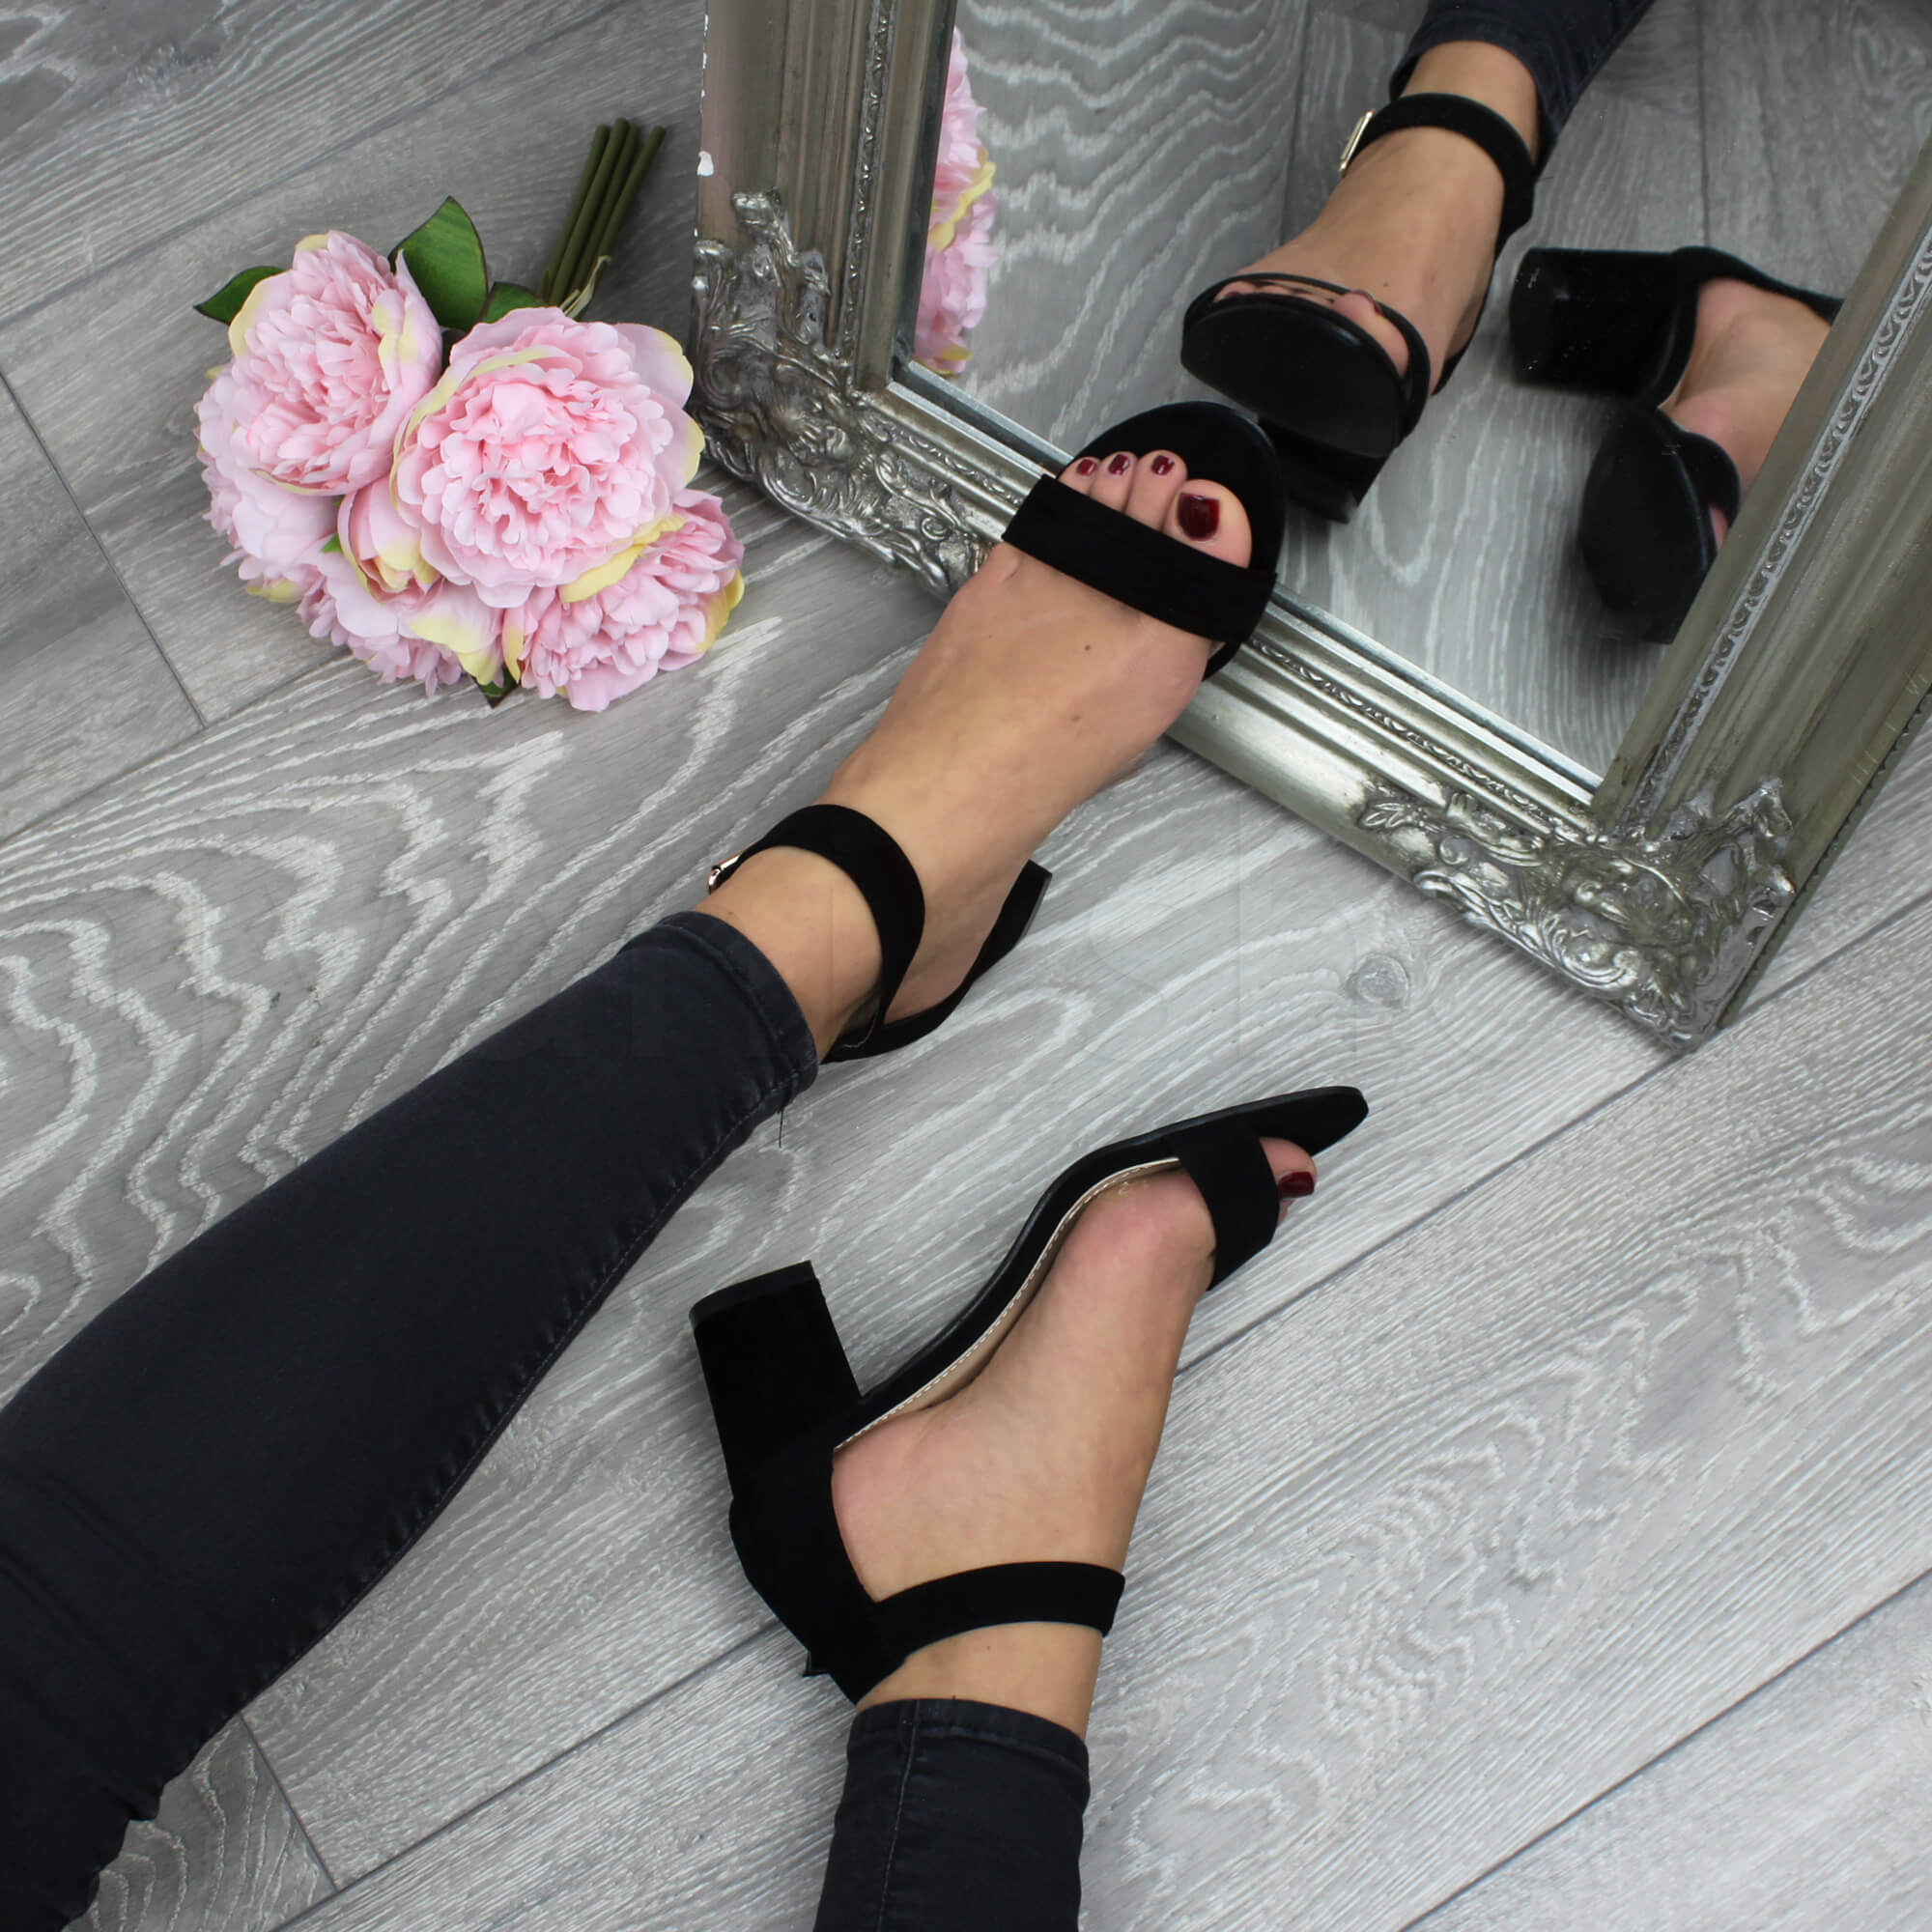 Donna-tacco-medio-fibbia-punta-aperta-caviglia-cinghietti-sandali-taglia miniatura 70